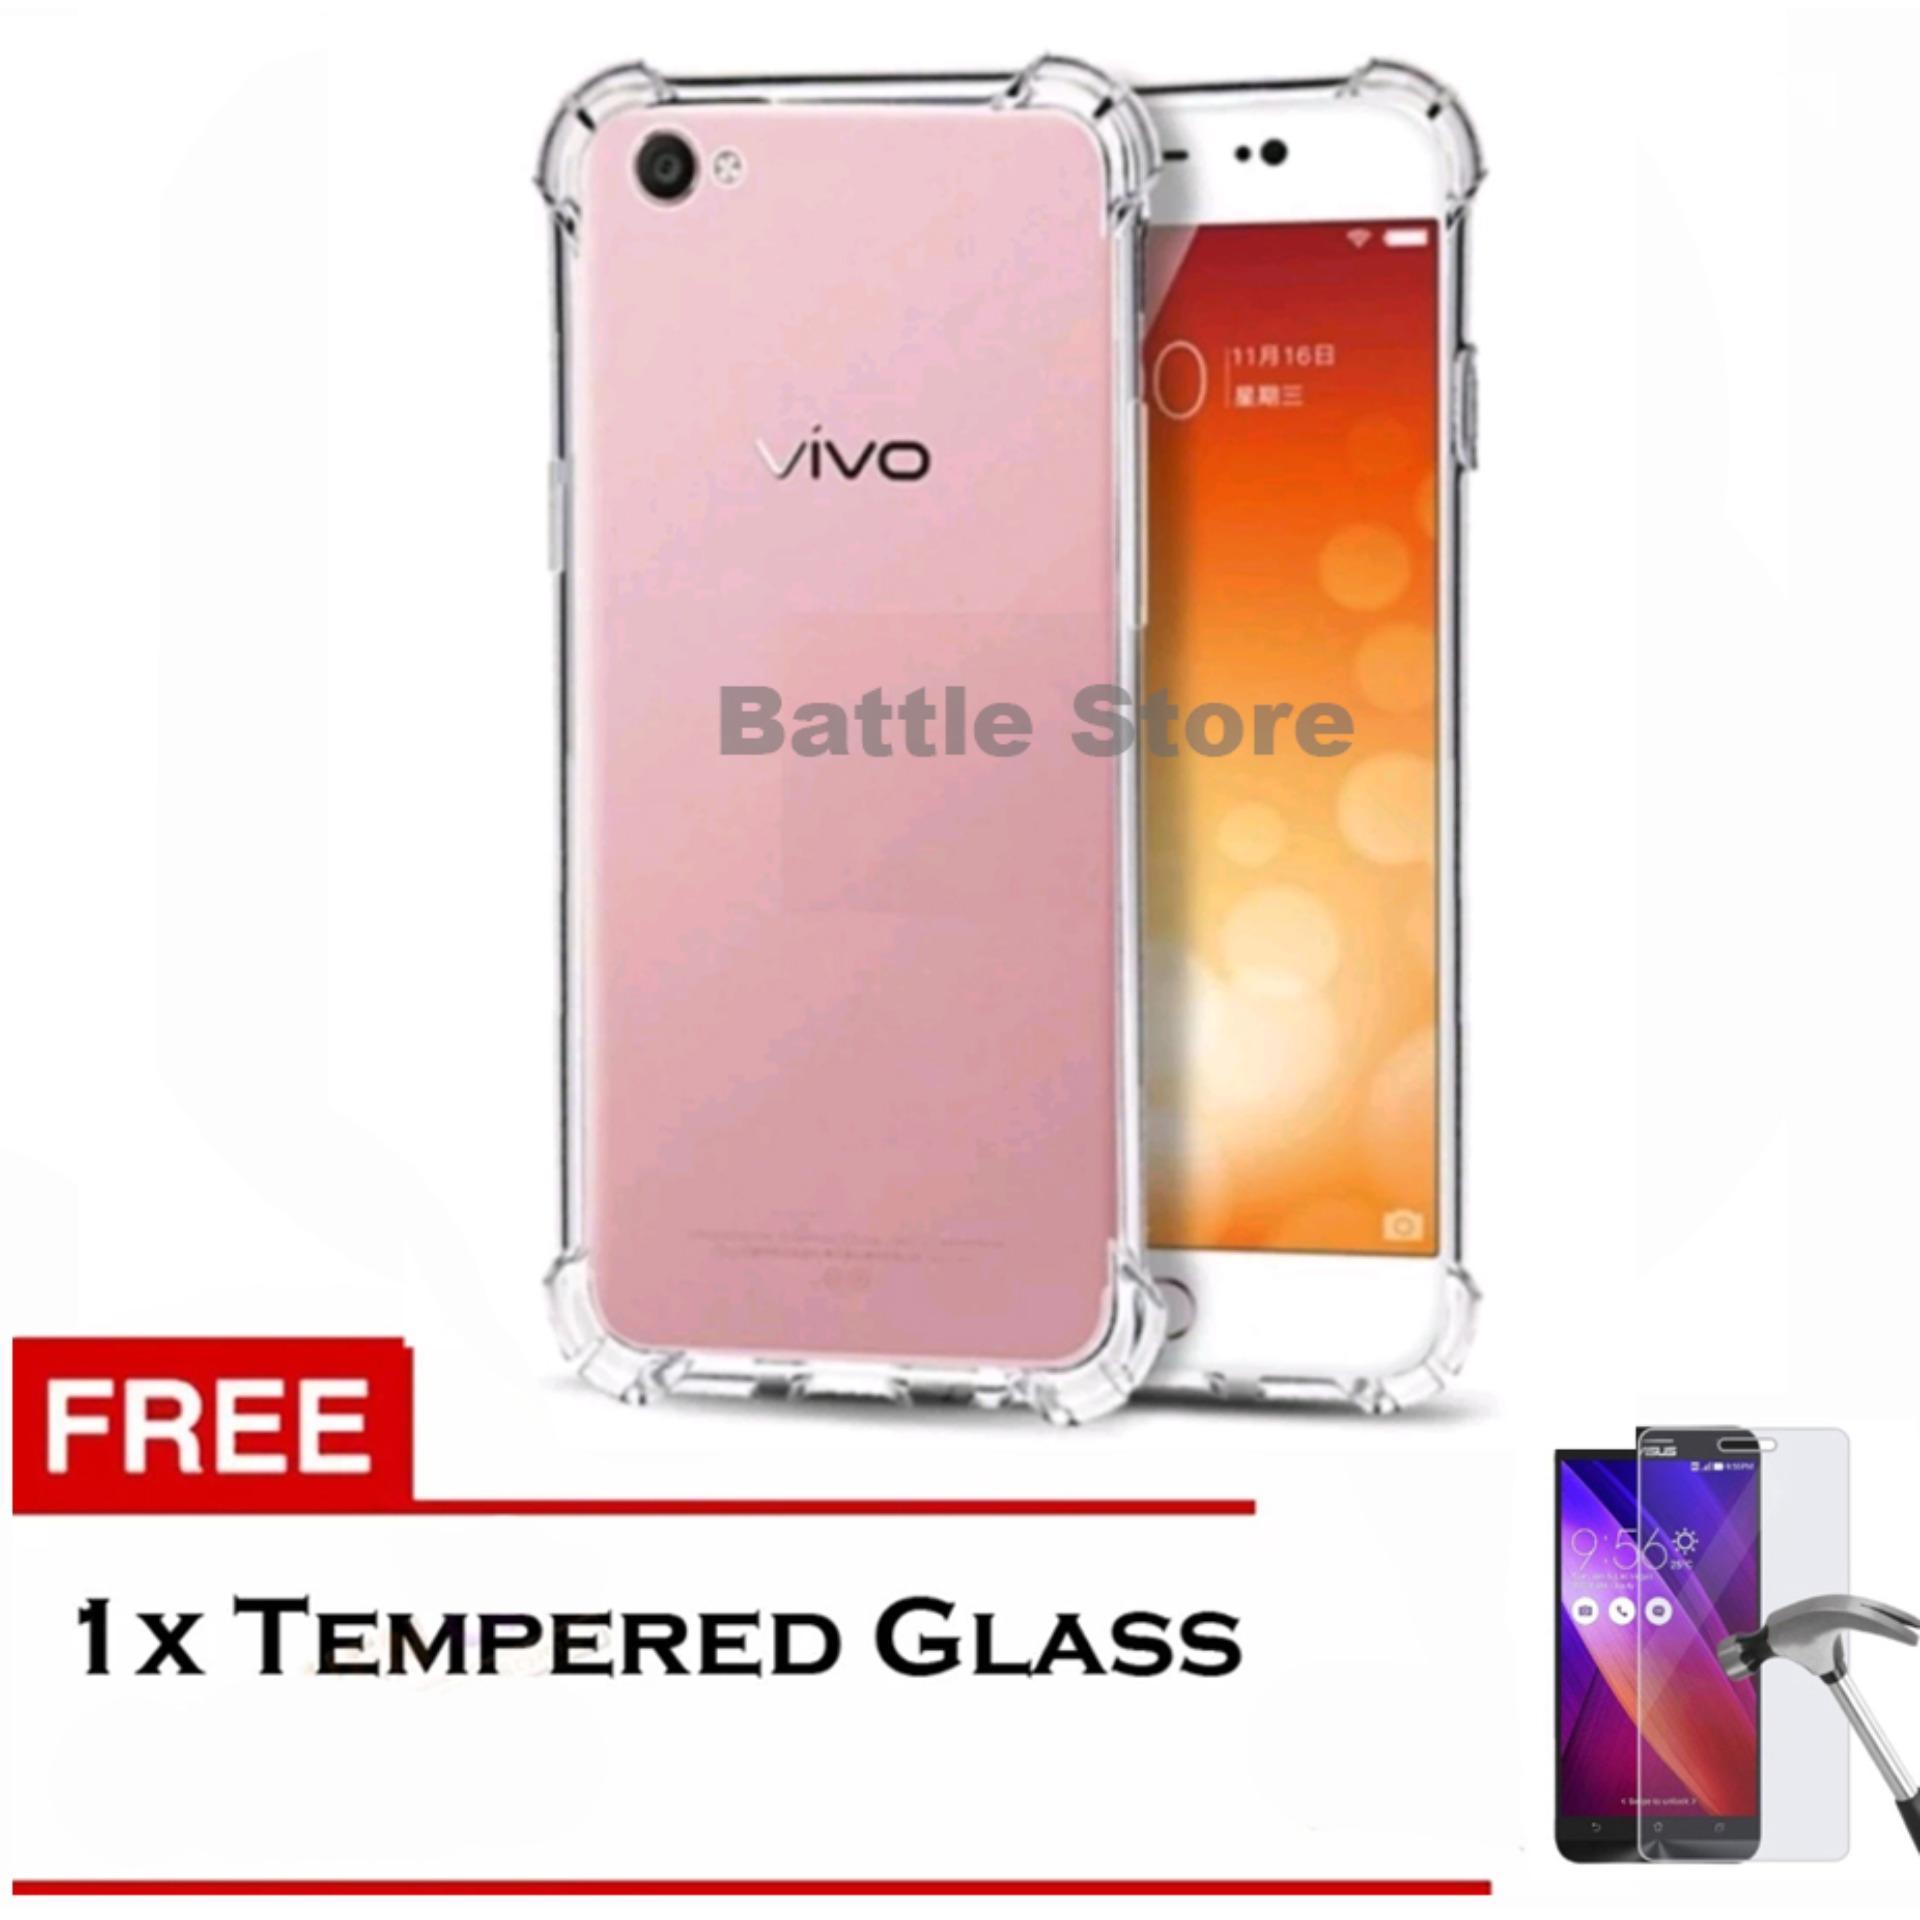 Cek Harga Baru Case Original Anti Shock Crack Elegan For Vivo Fuze Y51 Putih Elegant Softcase Y53 Free Tempered Glass